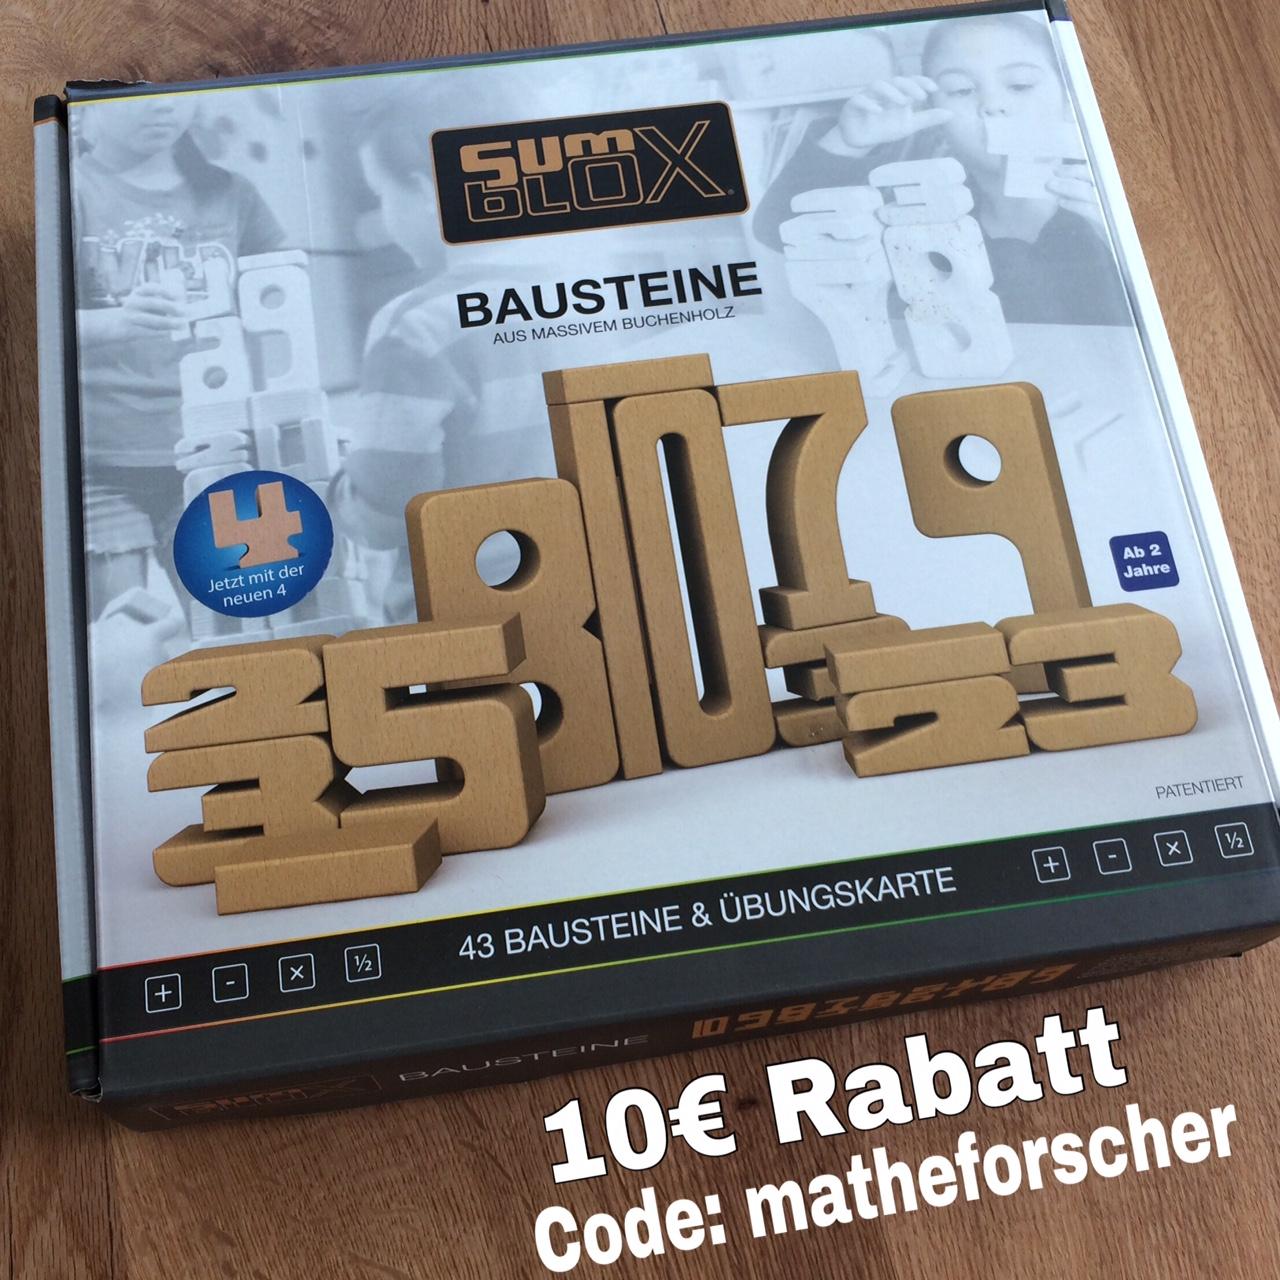 Matheforscher Rabattcode